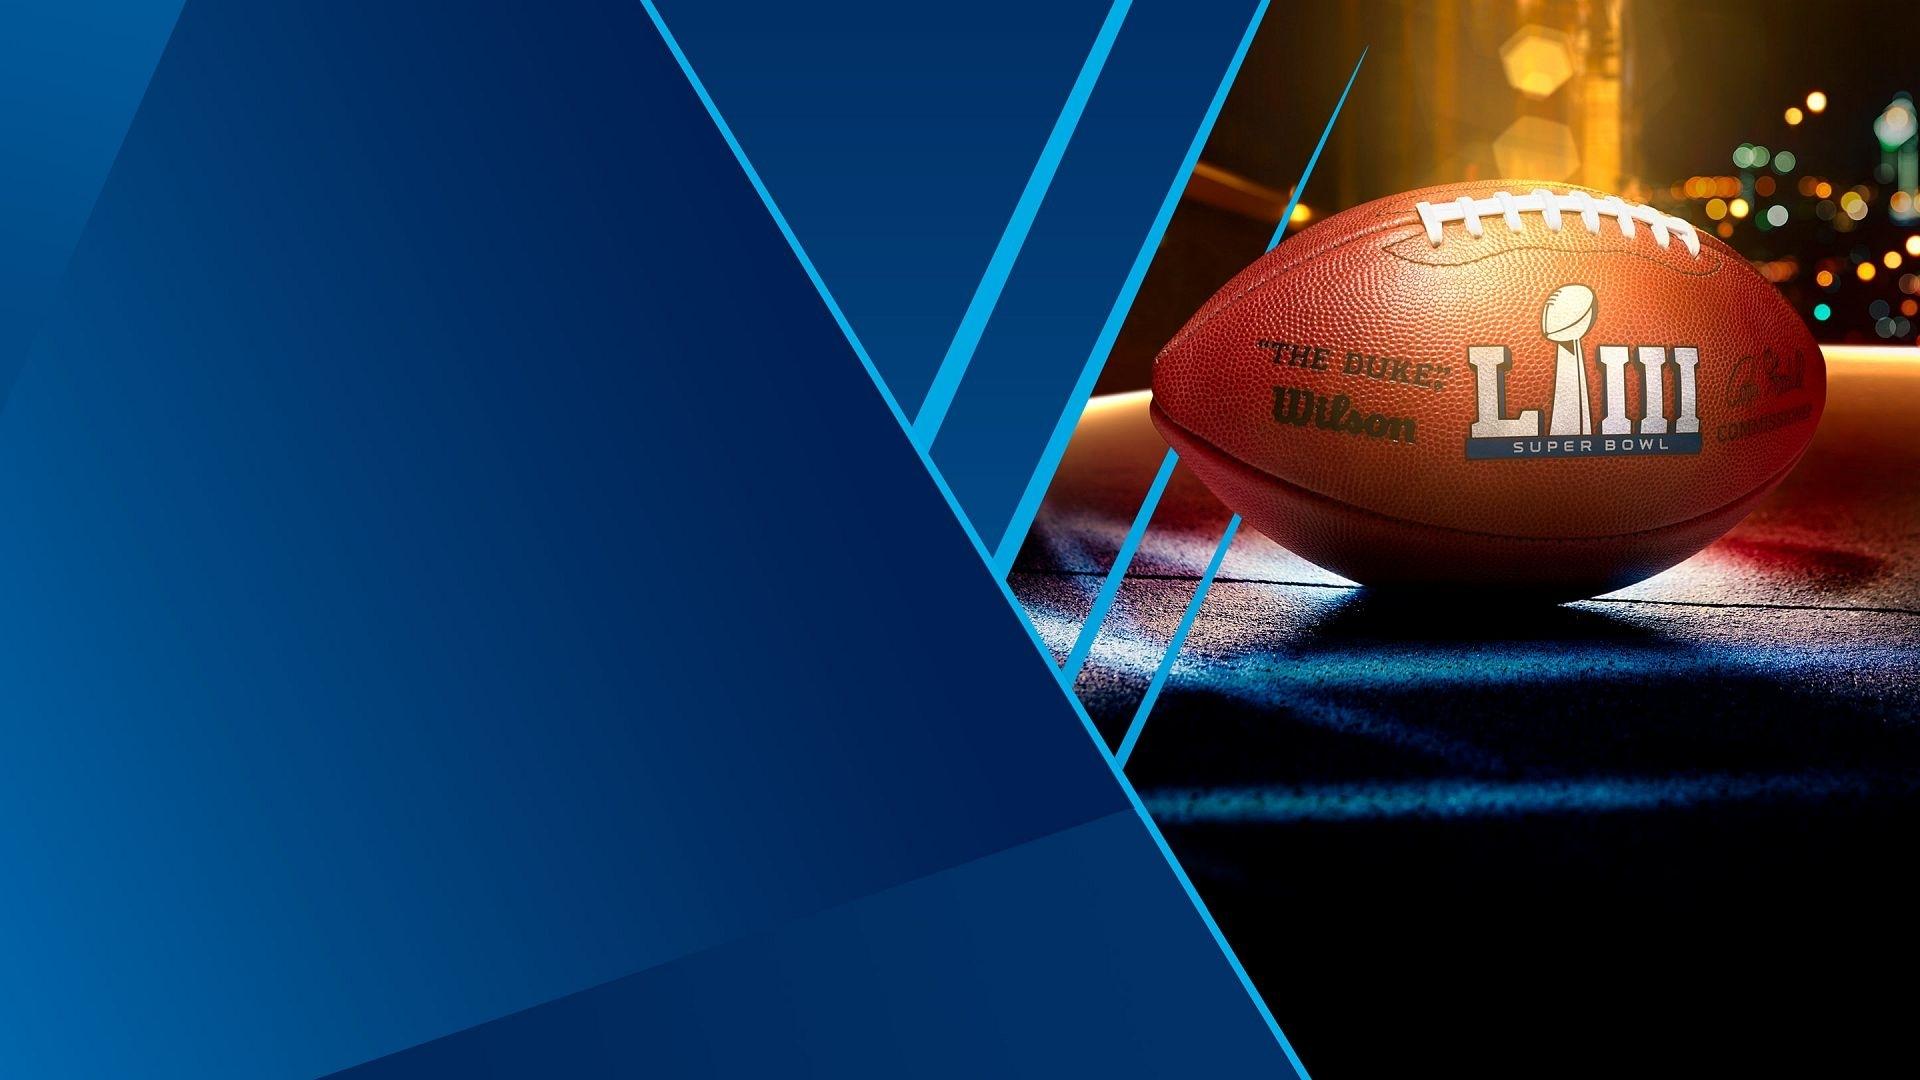 Watch Super Bowl 2019 - Live Stream Rams Vs Patriots Online regarding Cbs Super Bowl 2019